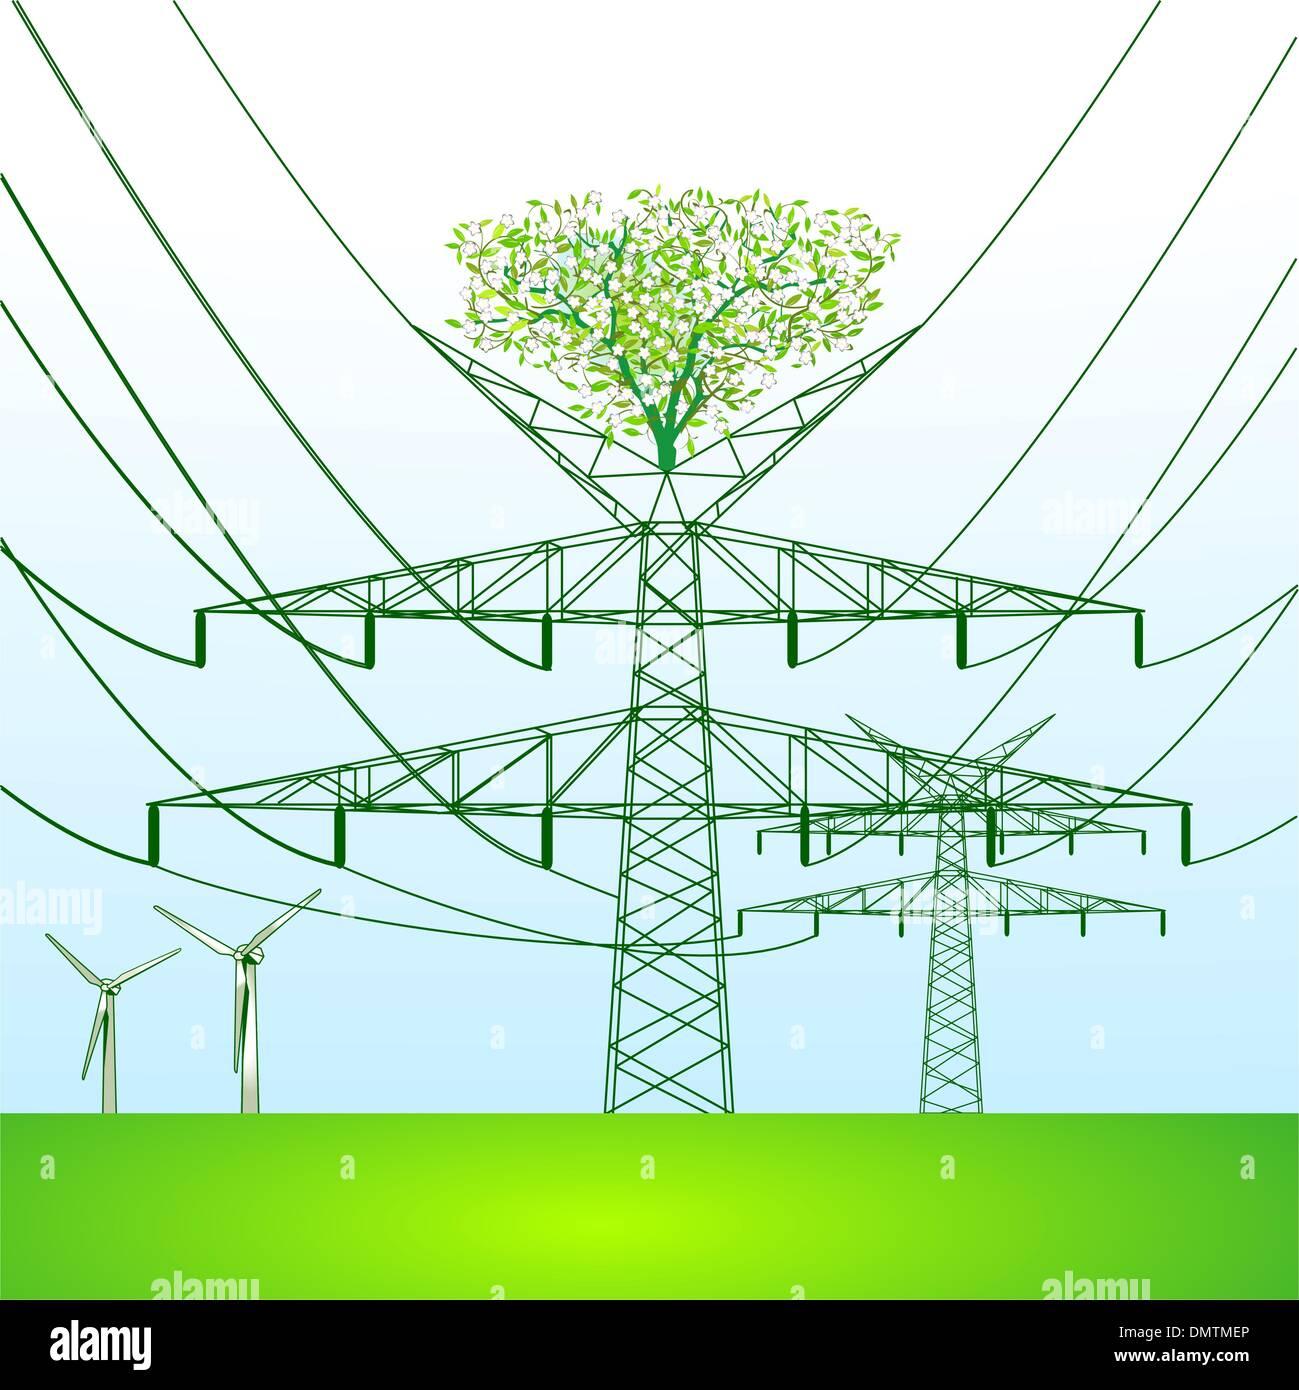 Vector Electrical Pole Diagram - DIY Enthusiasts Wiring Diagrams •